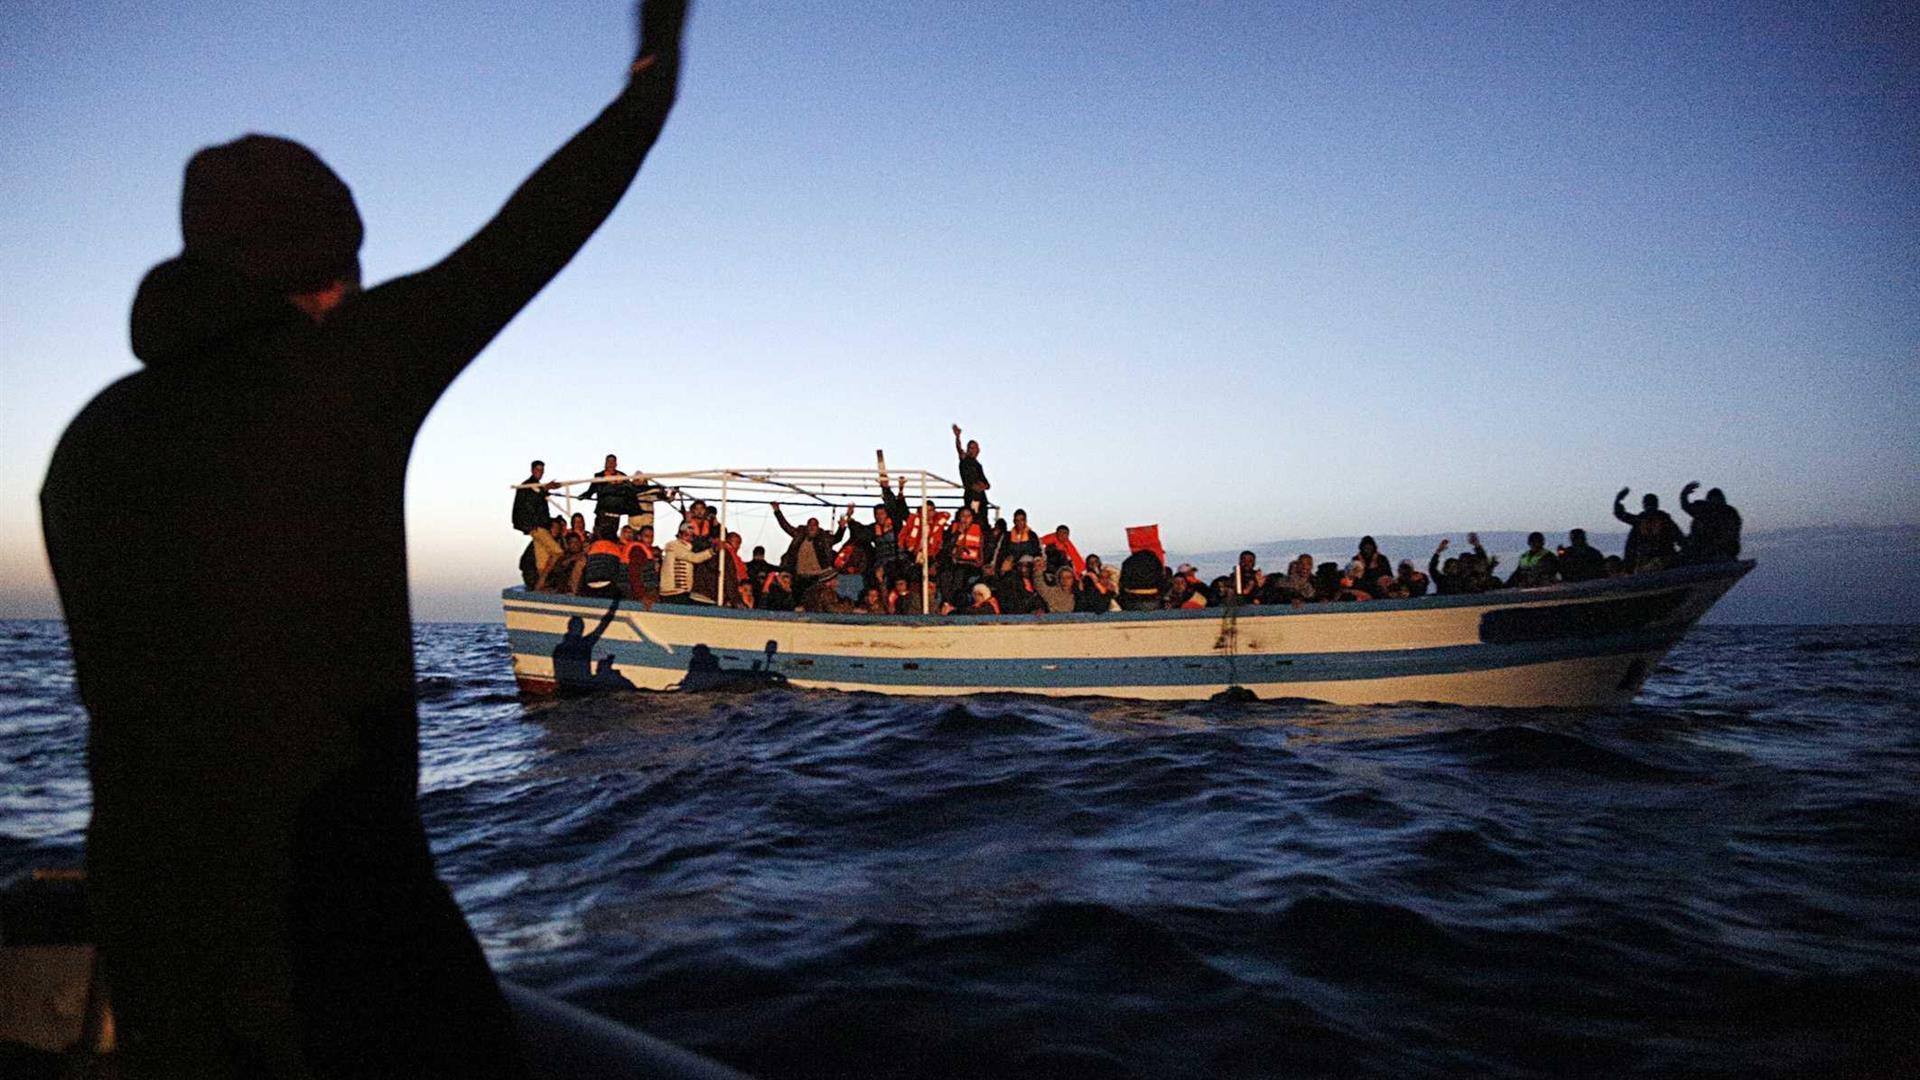 migranti-minniti-orlando-1